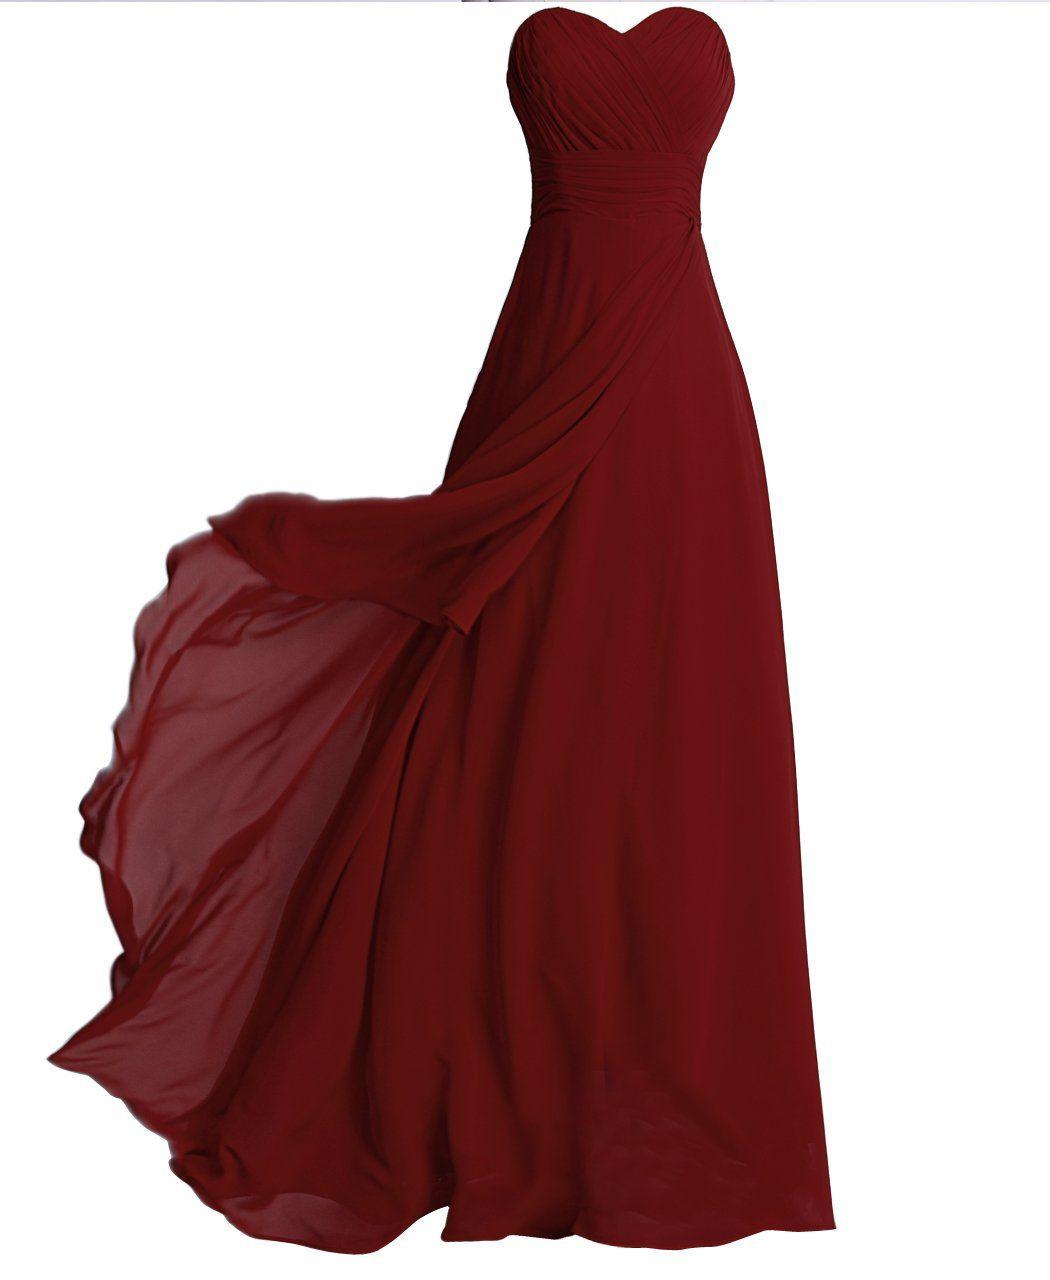 Fashion Plaza Chiffon Ohne Träger Langer Abendkleid Modul